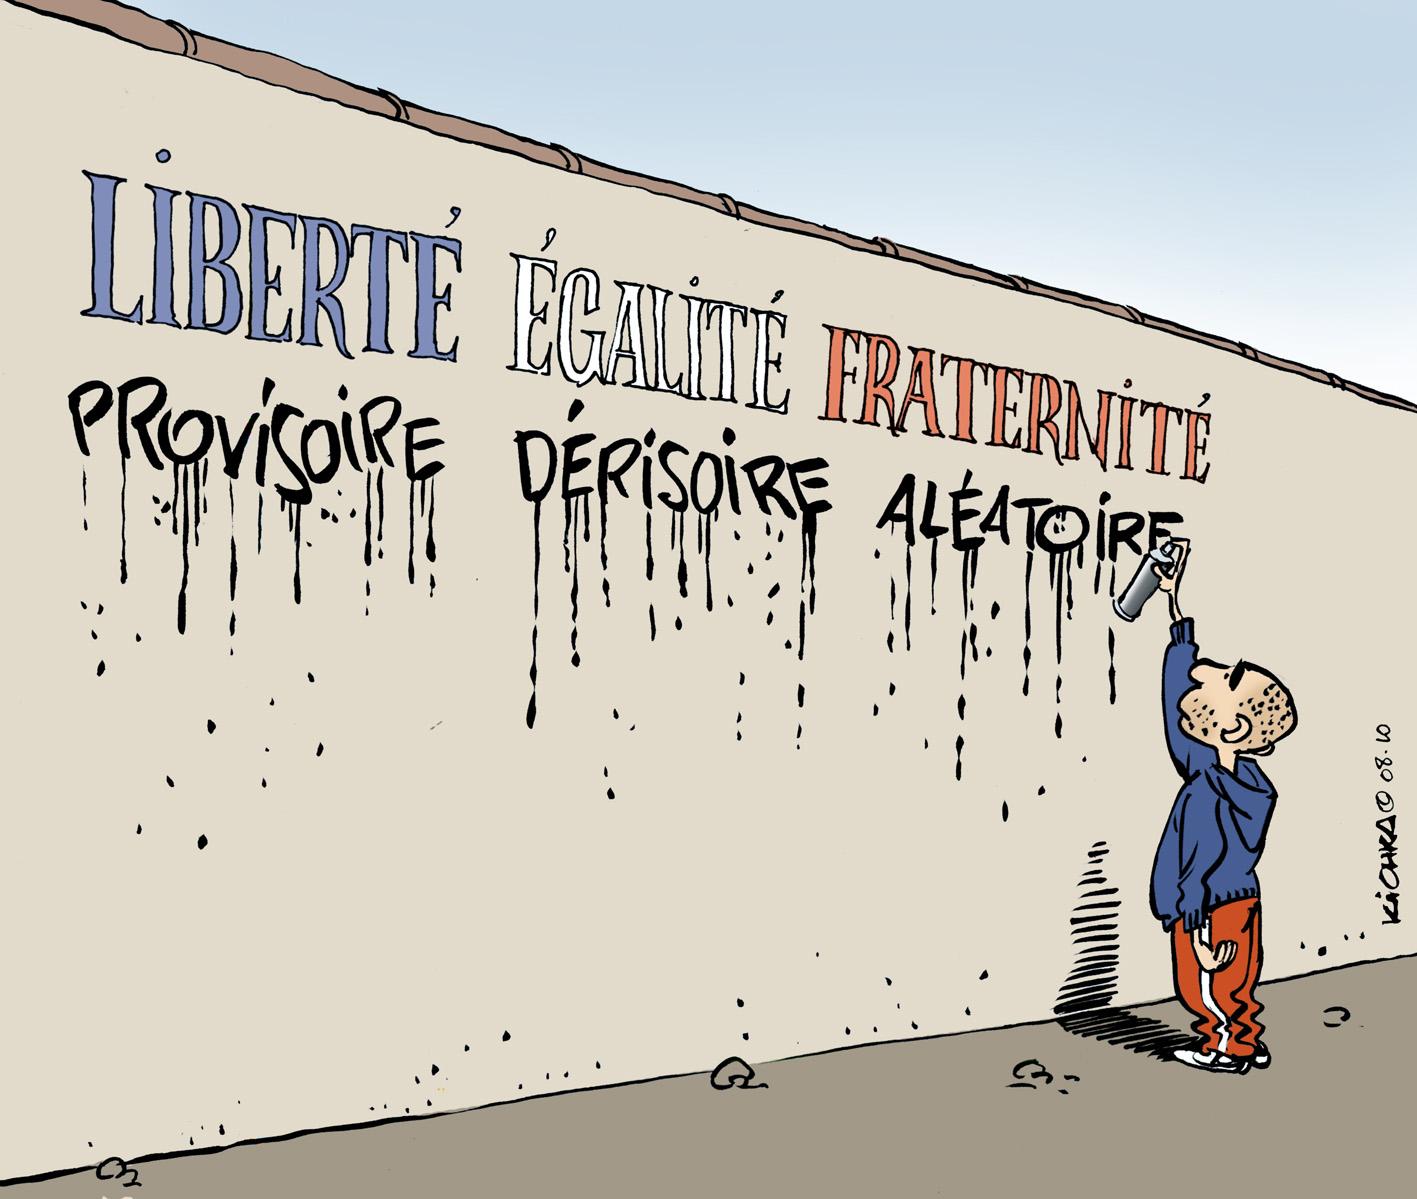 liberte egalite